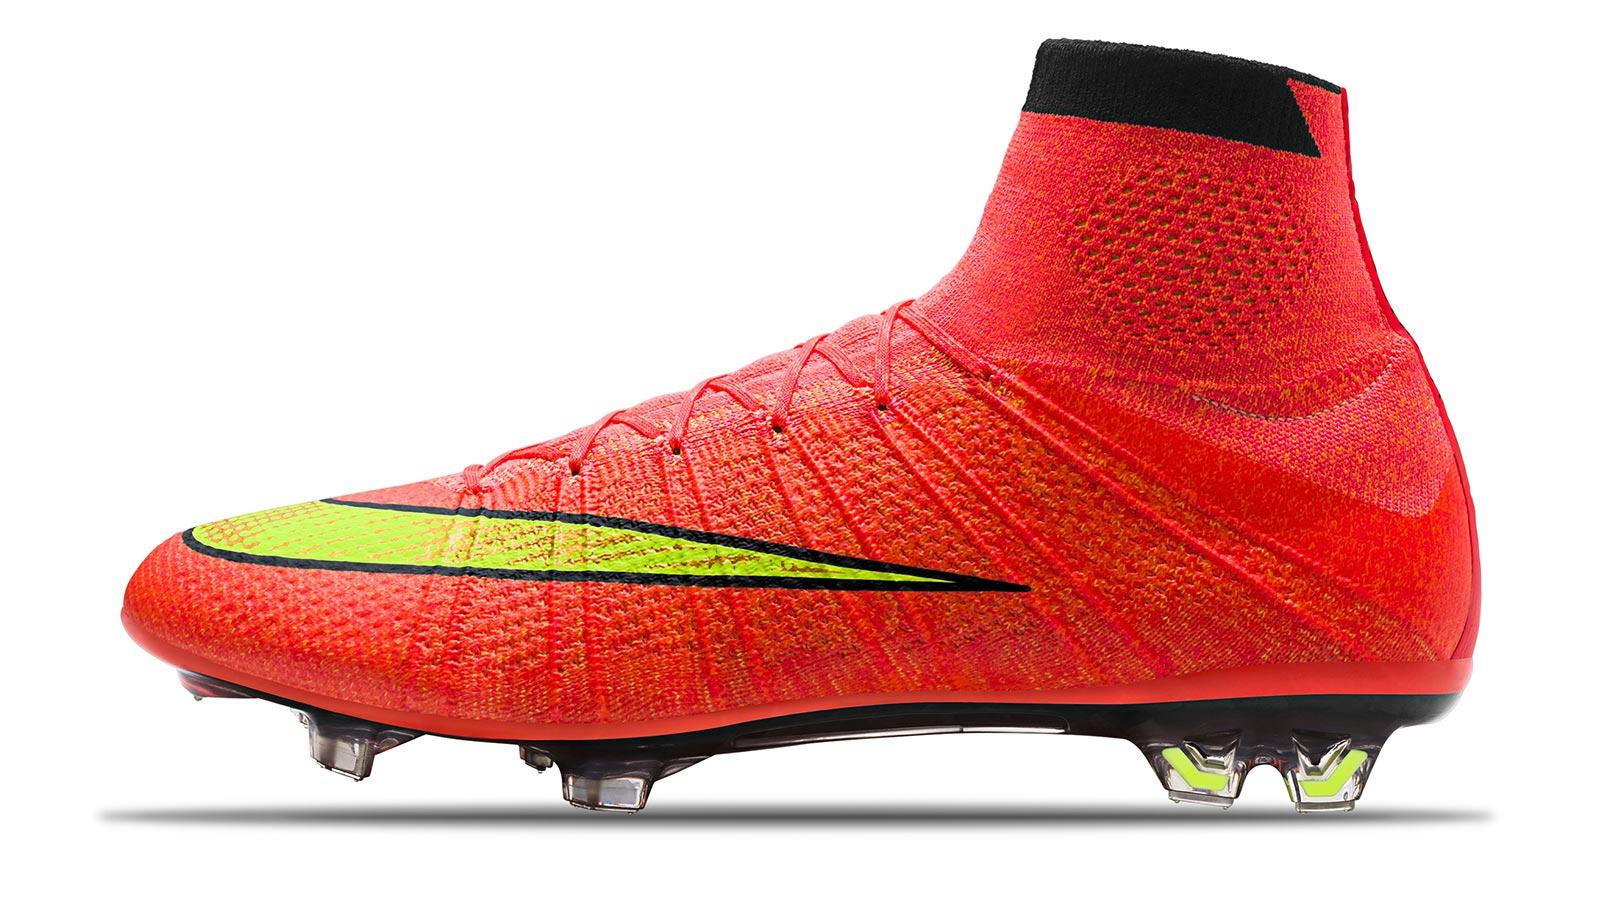 c1baf7d6035 ronaldo football boots cheap   OFF46% The Largest Catalog Discounts